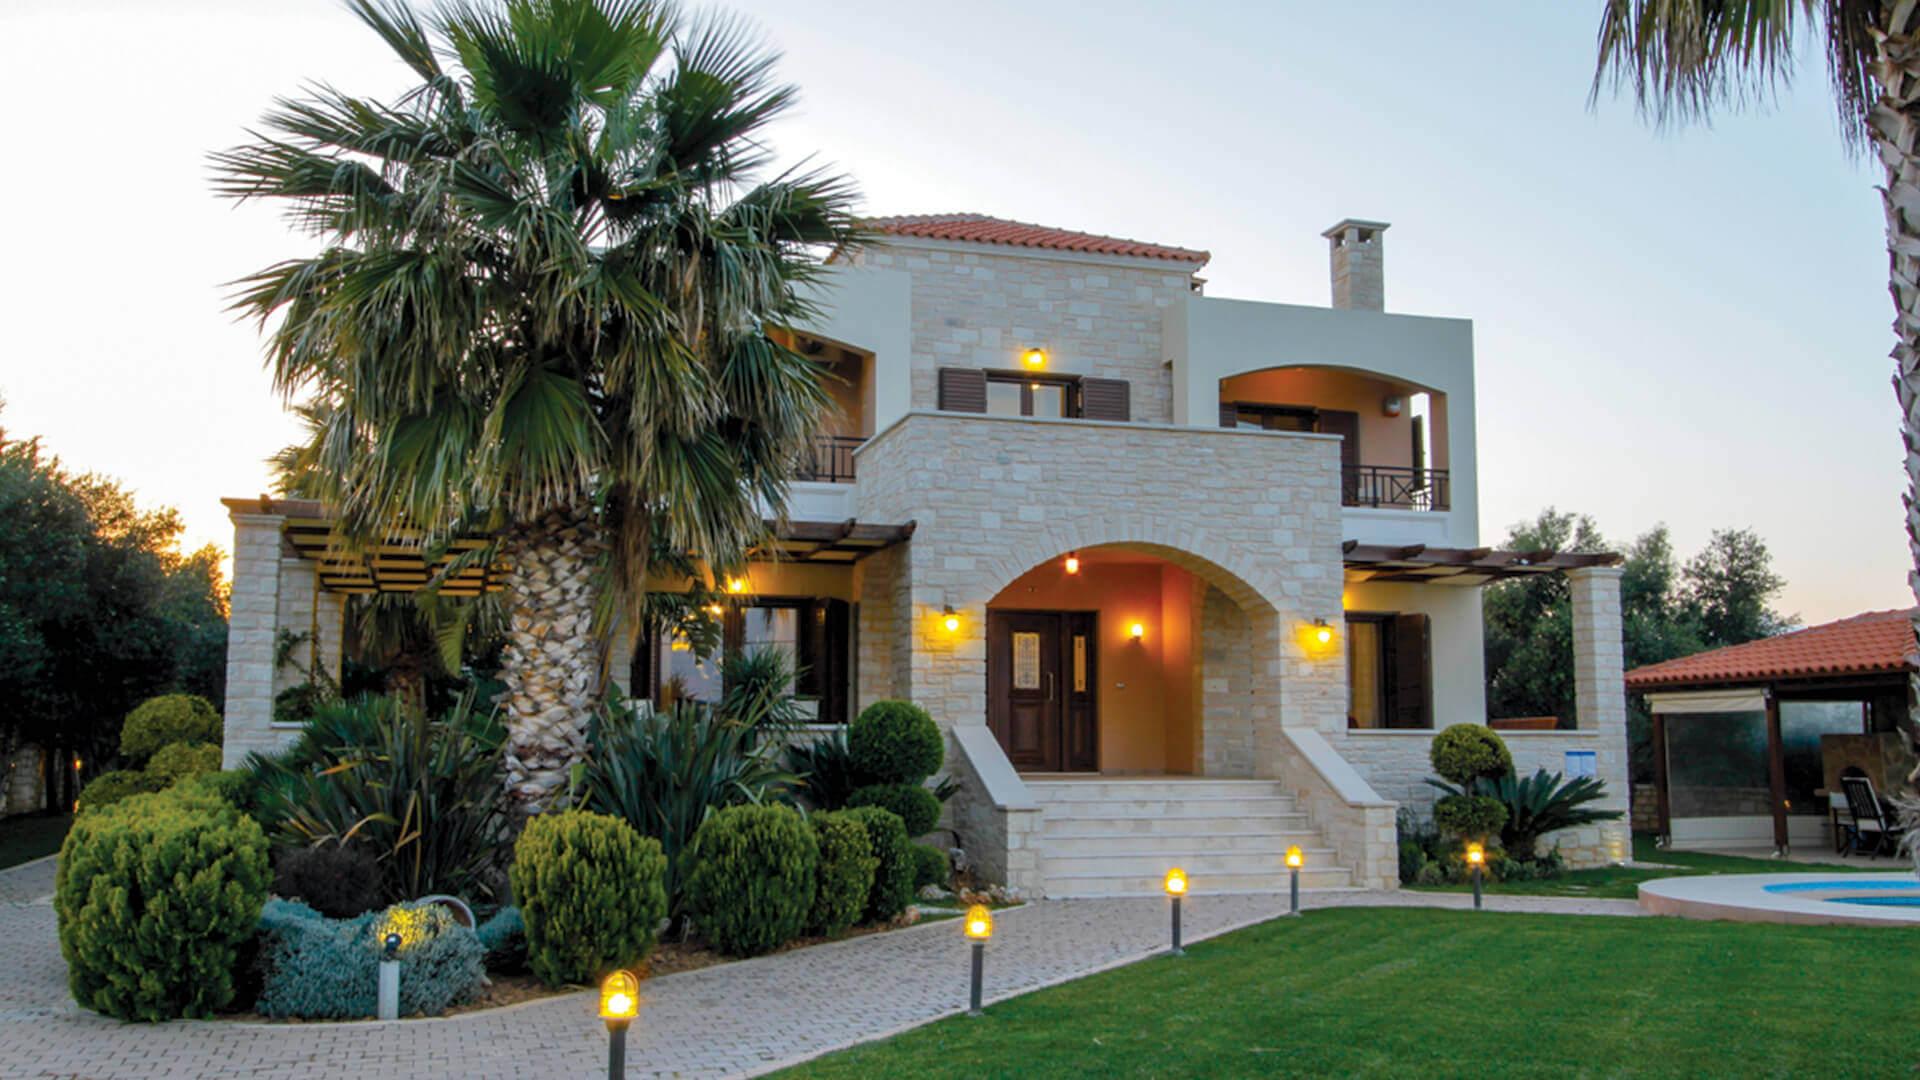 Luxury Villa for Sale in Kolymbari - Minoan Homes